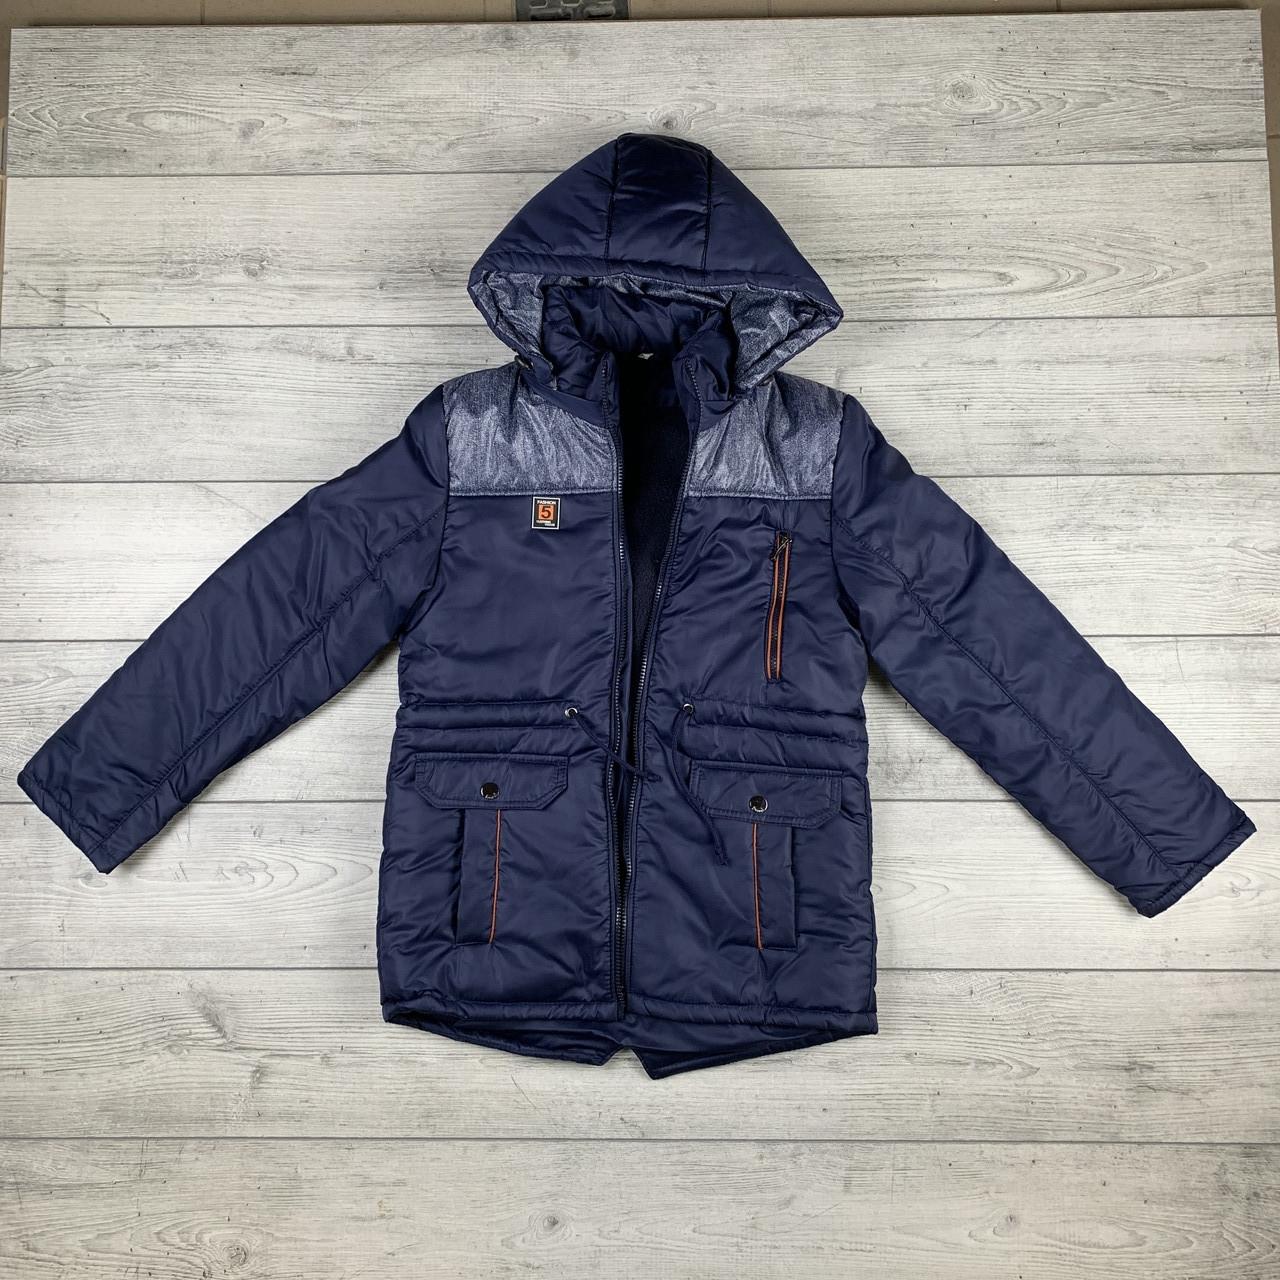 Осенняя курточка на мальчика 9-14 лет, размеры 134-158